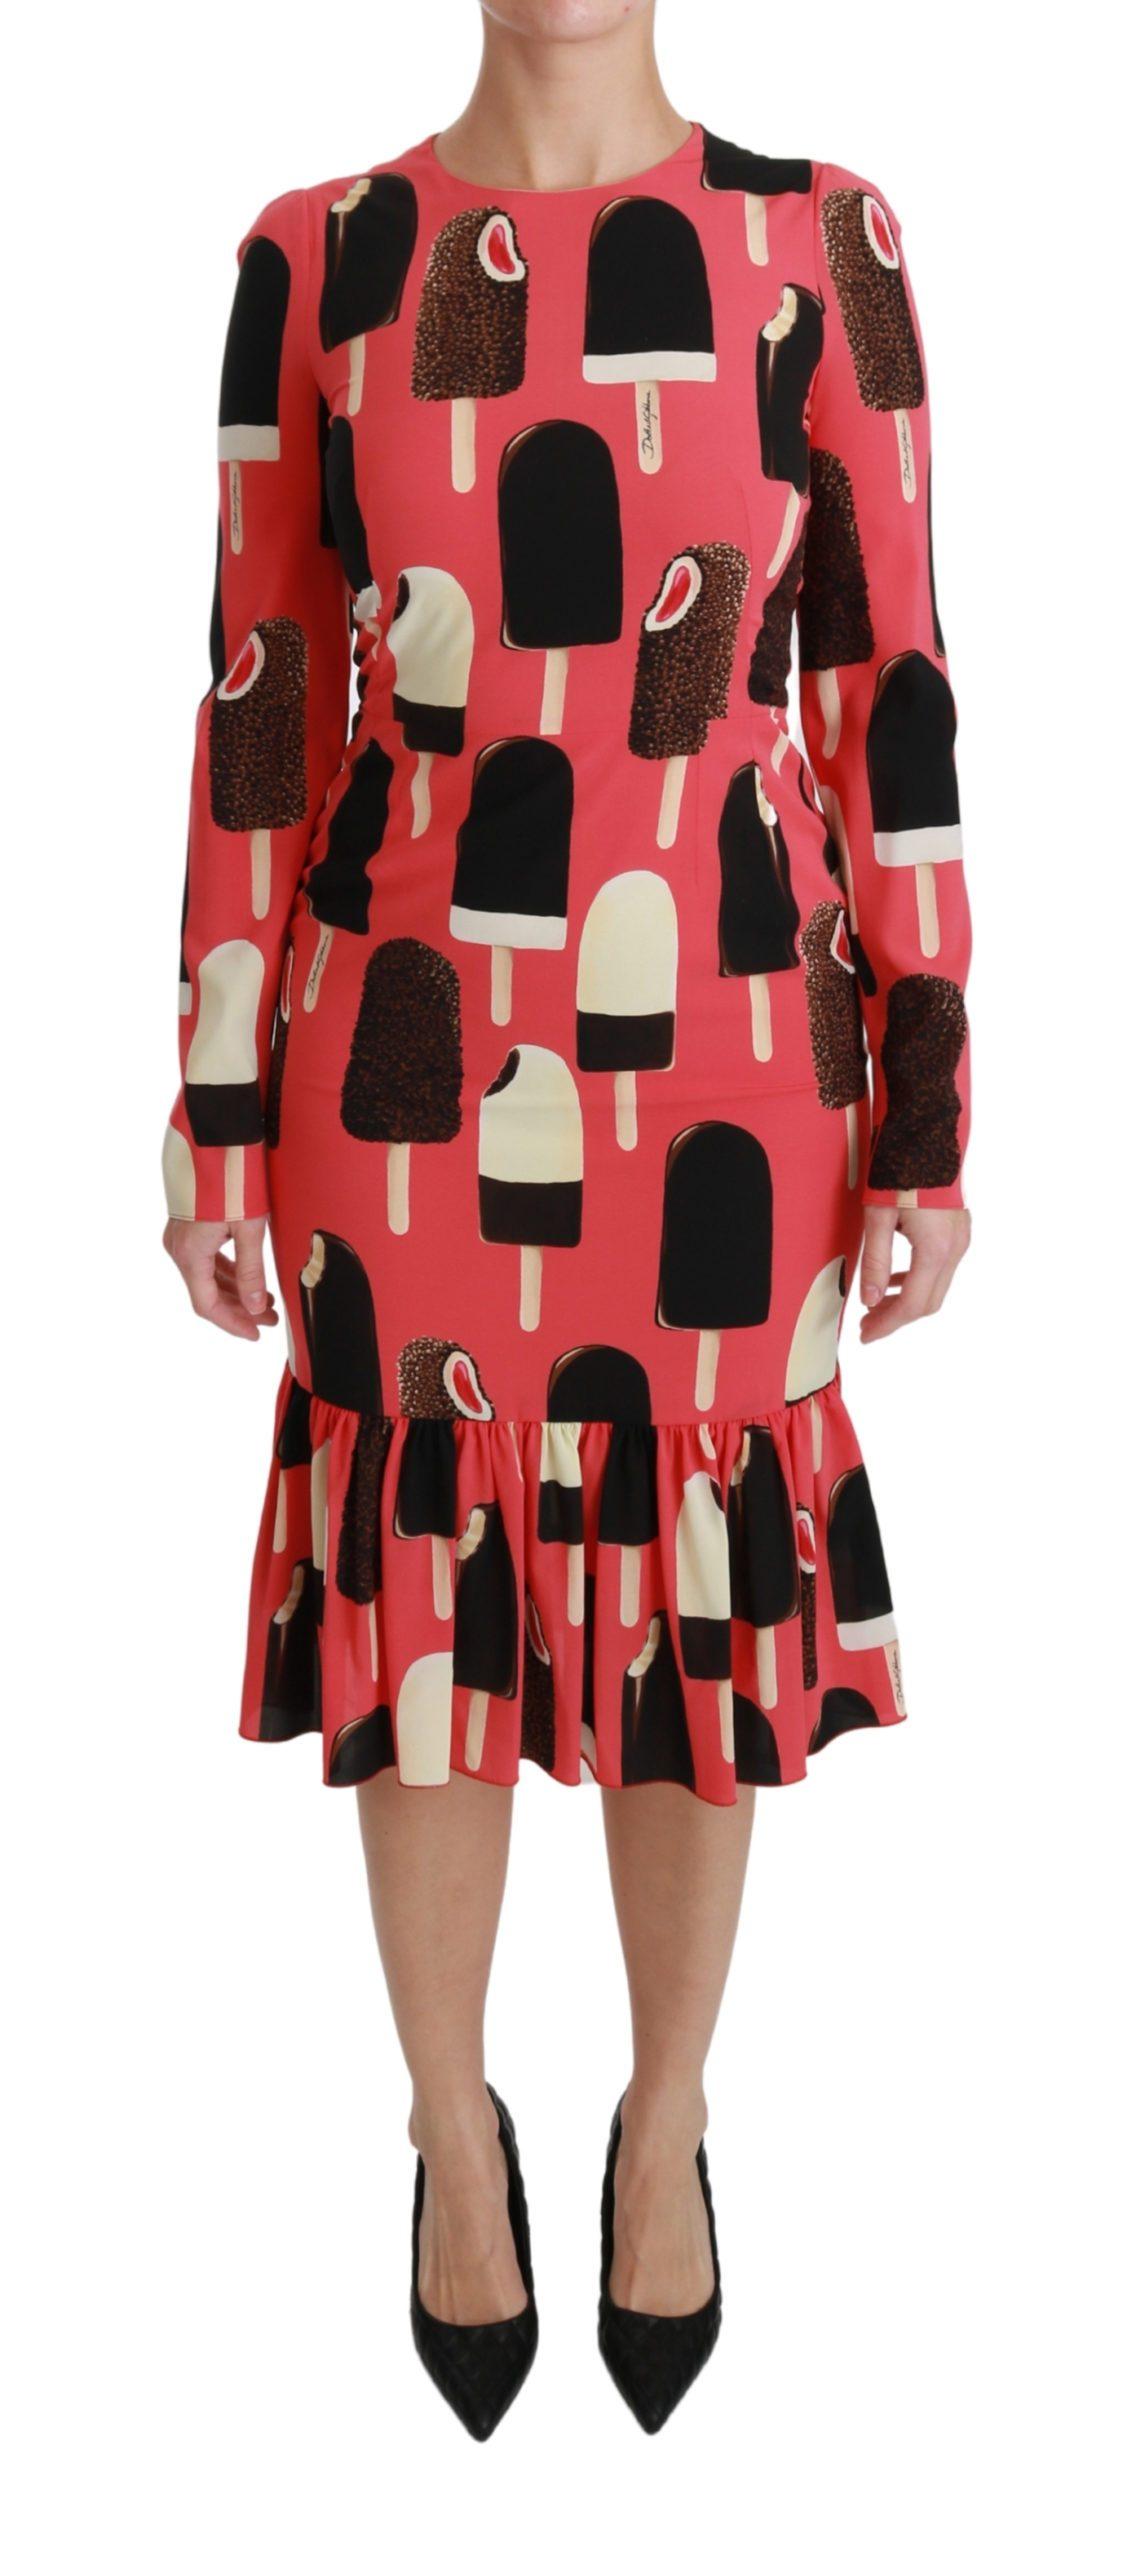 Dolce & Gabbana Women's Silk Stretch Ice Cream Sheath Dress Pink DR2506 - IT36   XS